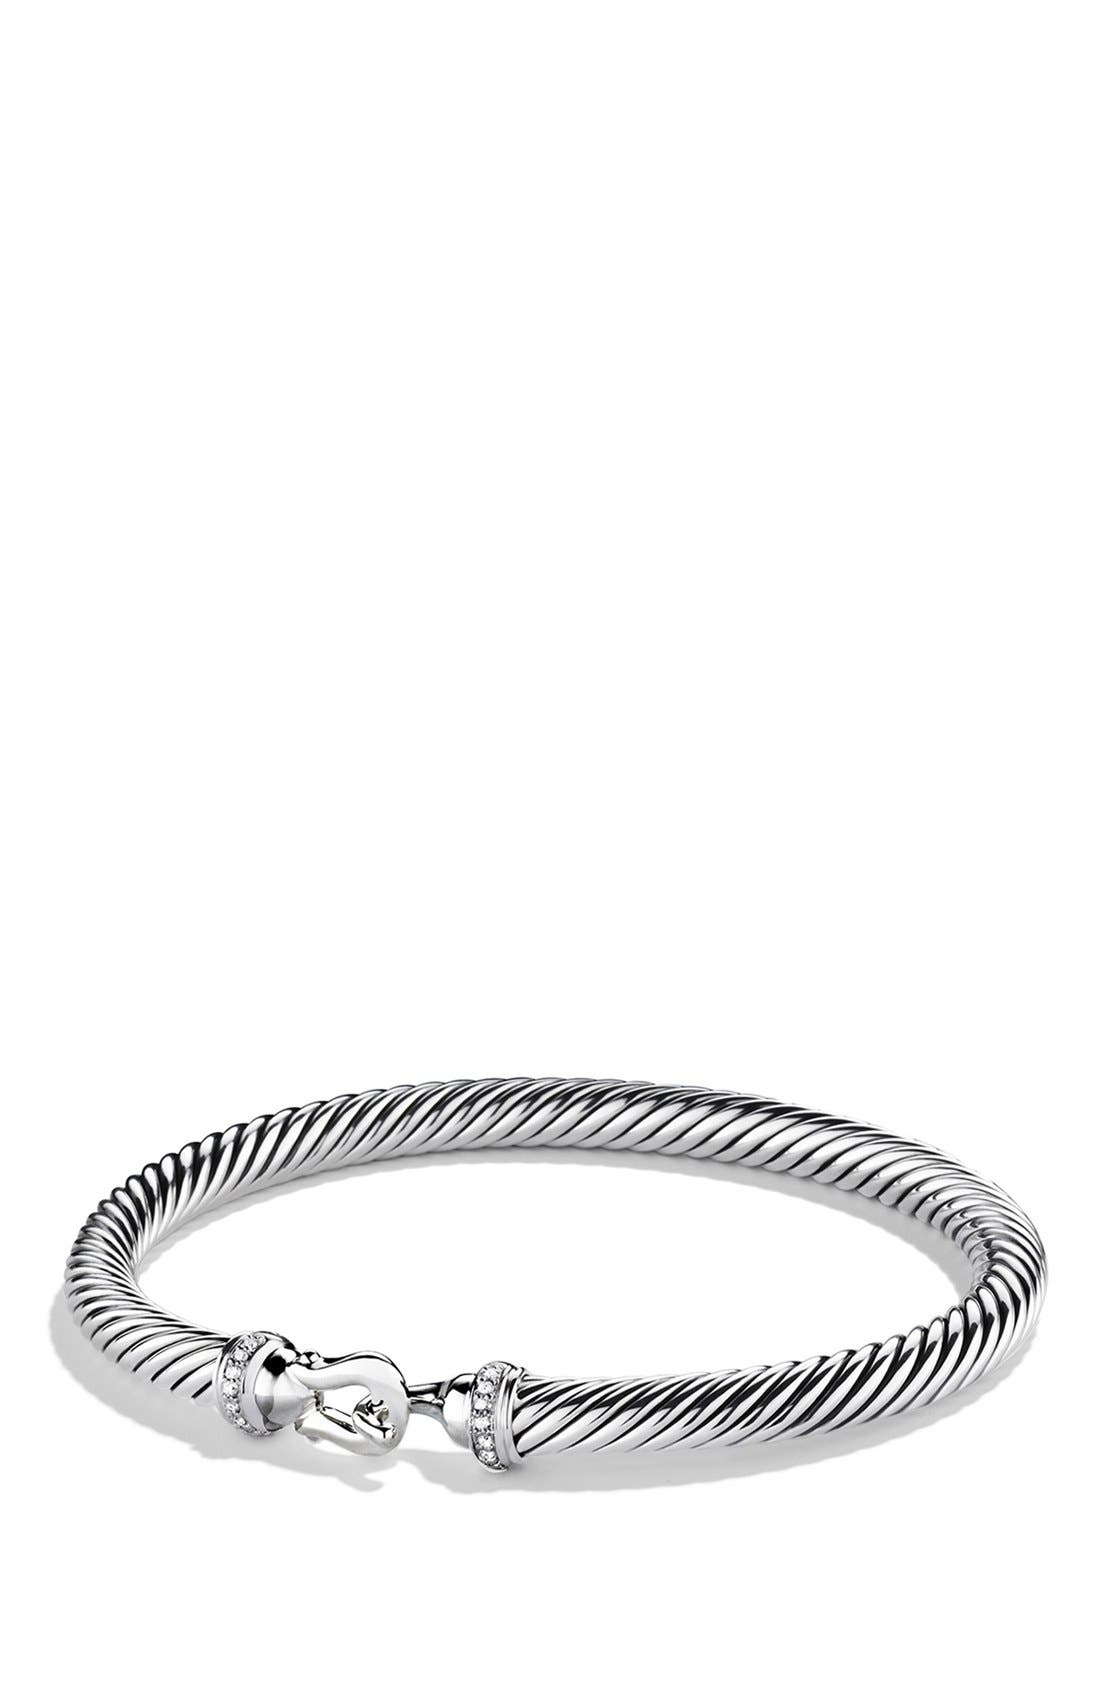 Alternate Image 1 Selected - David Yurman 'Cable Buckle' Bracelet with Diamonds